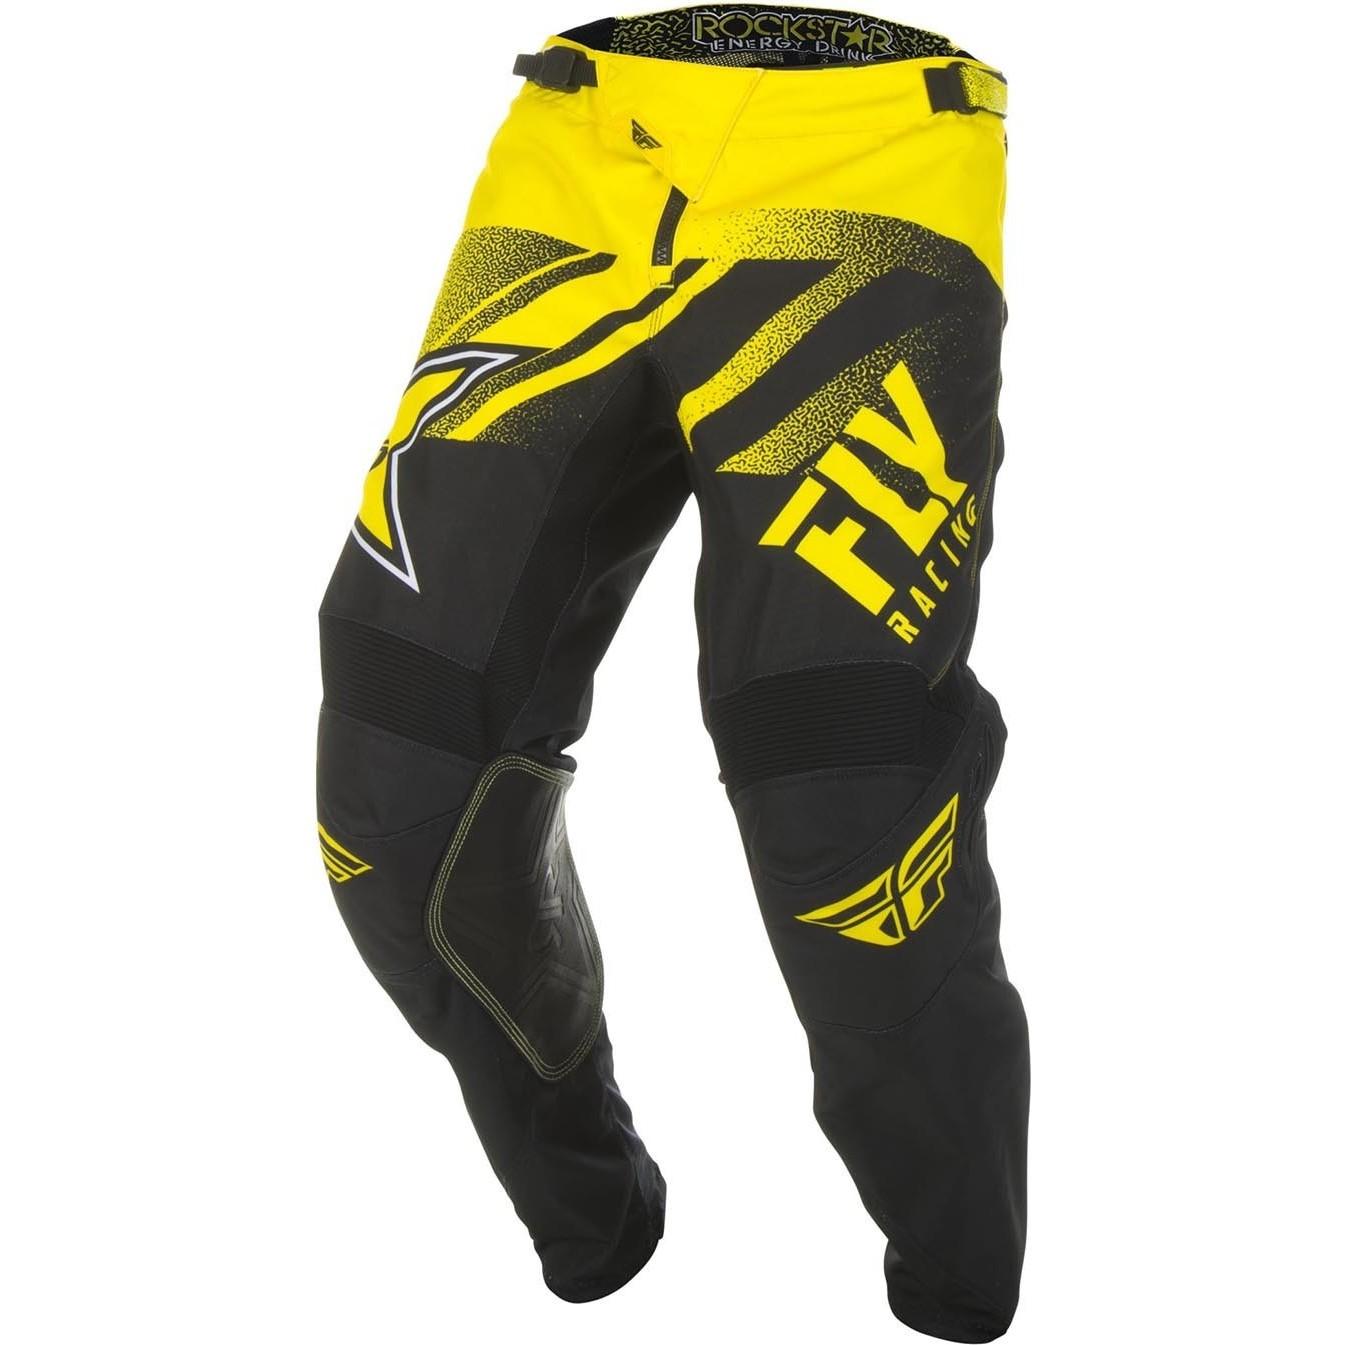 Fly Racing 2019 Kinetic Rockstar Motocross Pants Clearance Ghostbikes Com